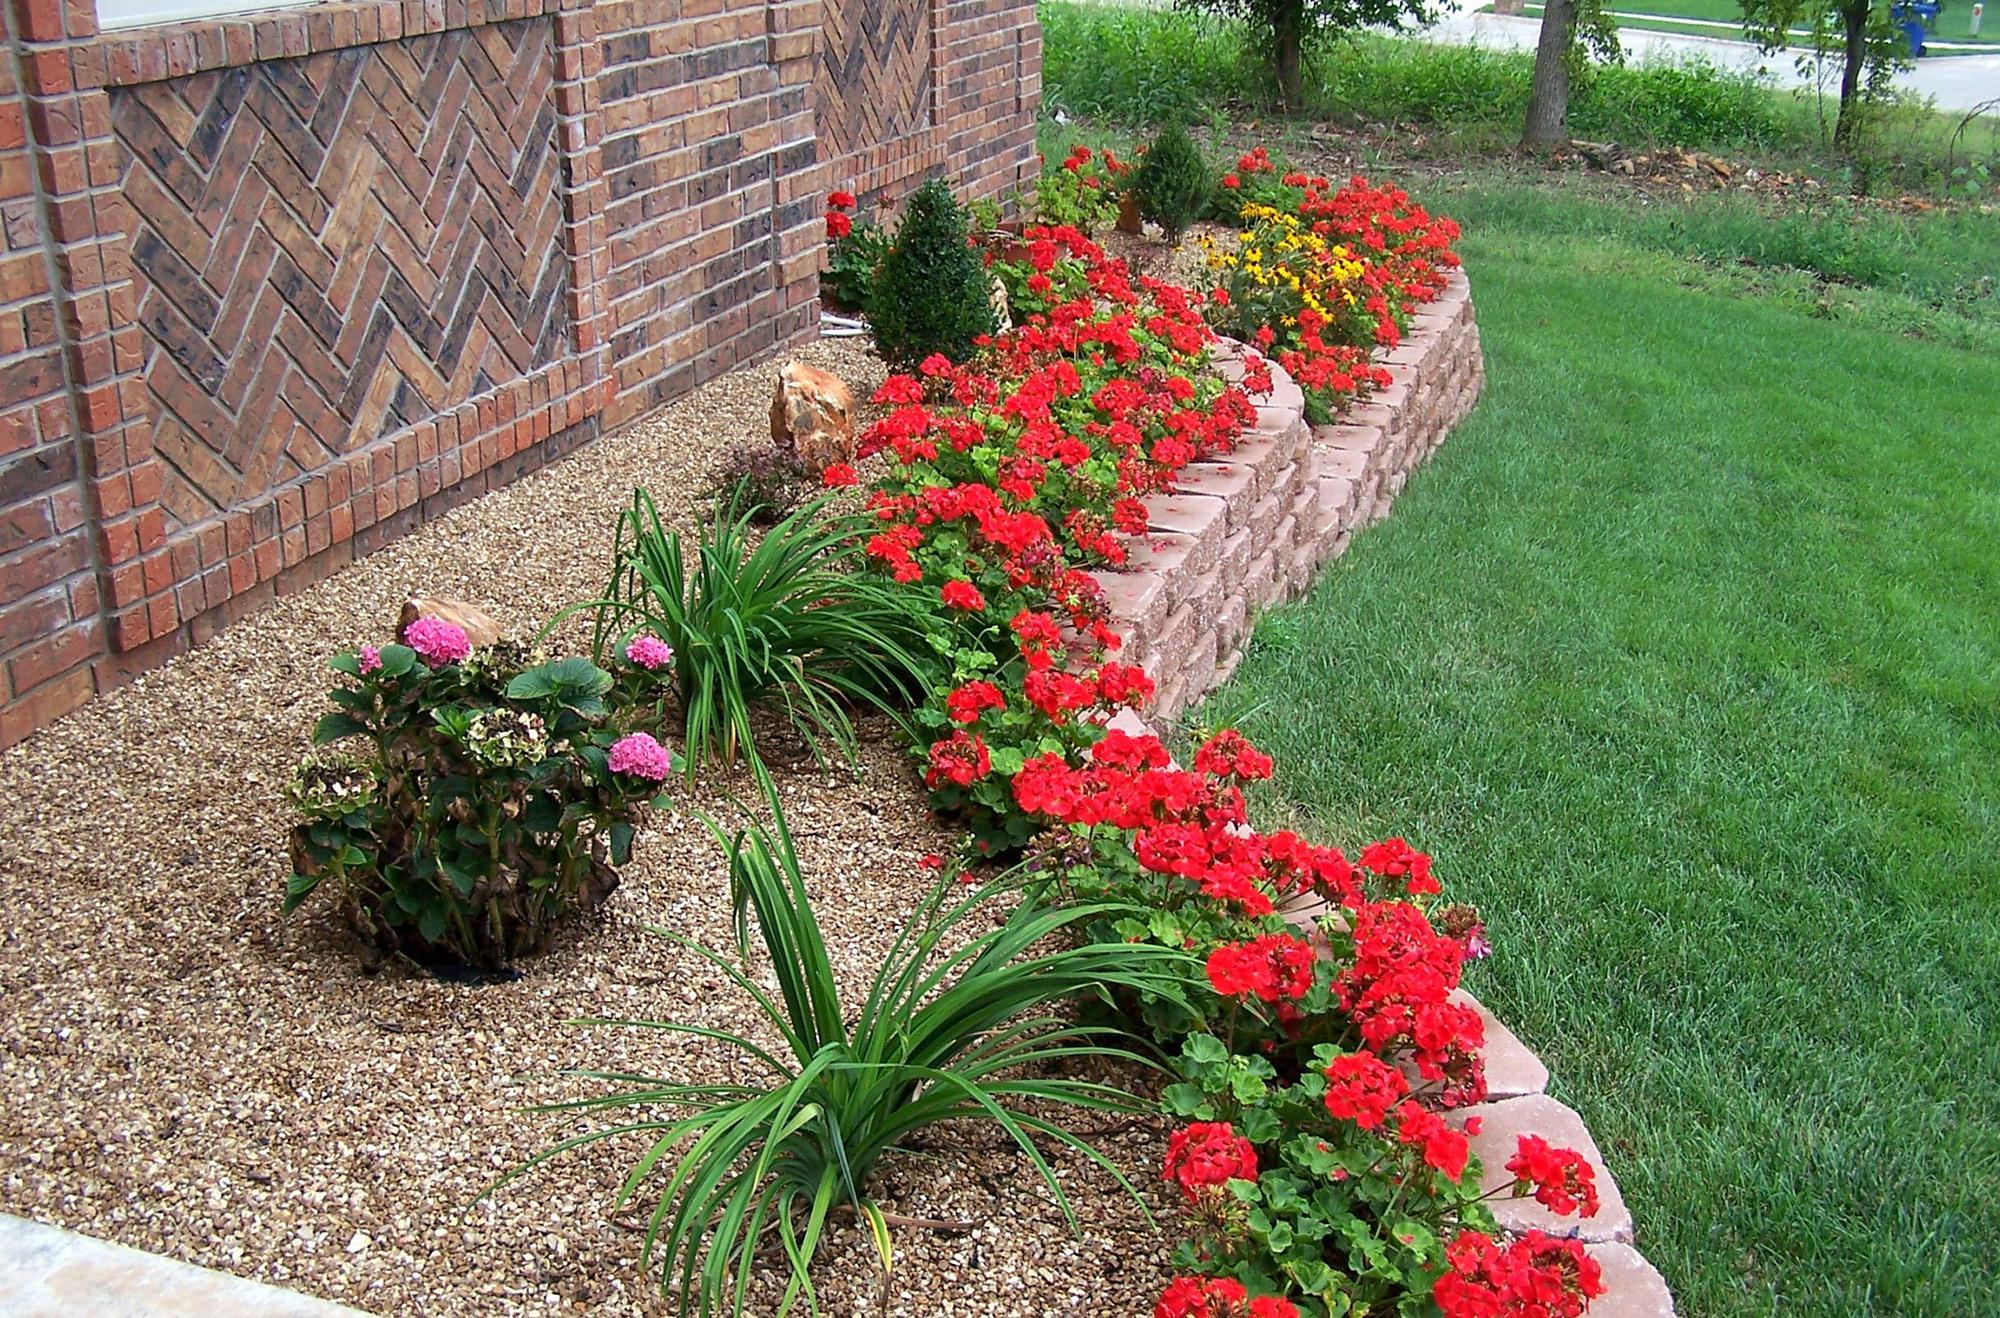 Яркая красная клумба и другие цветы на даче